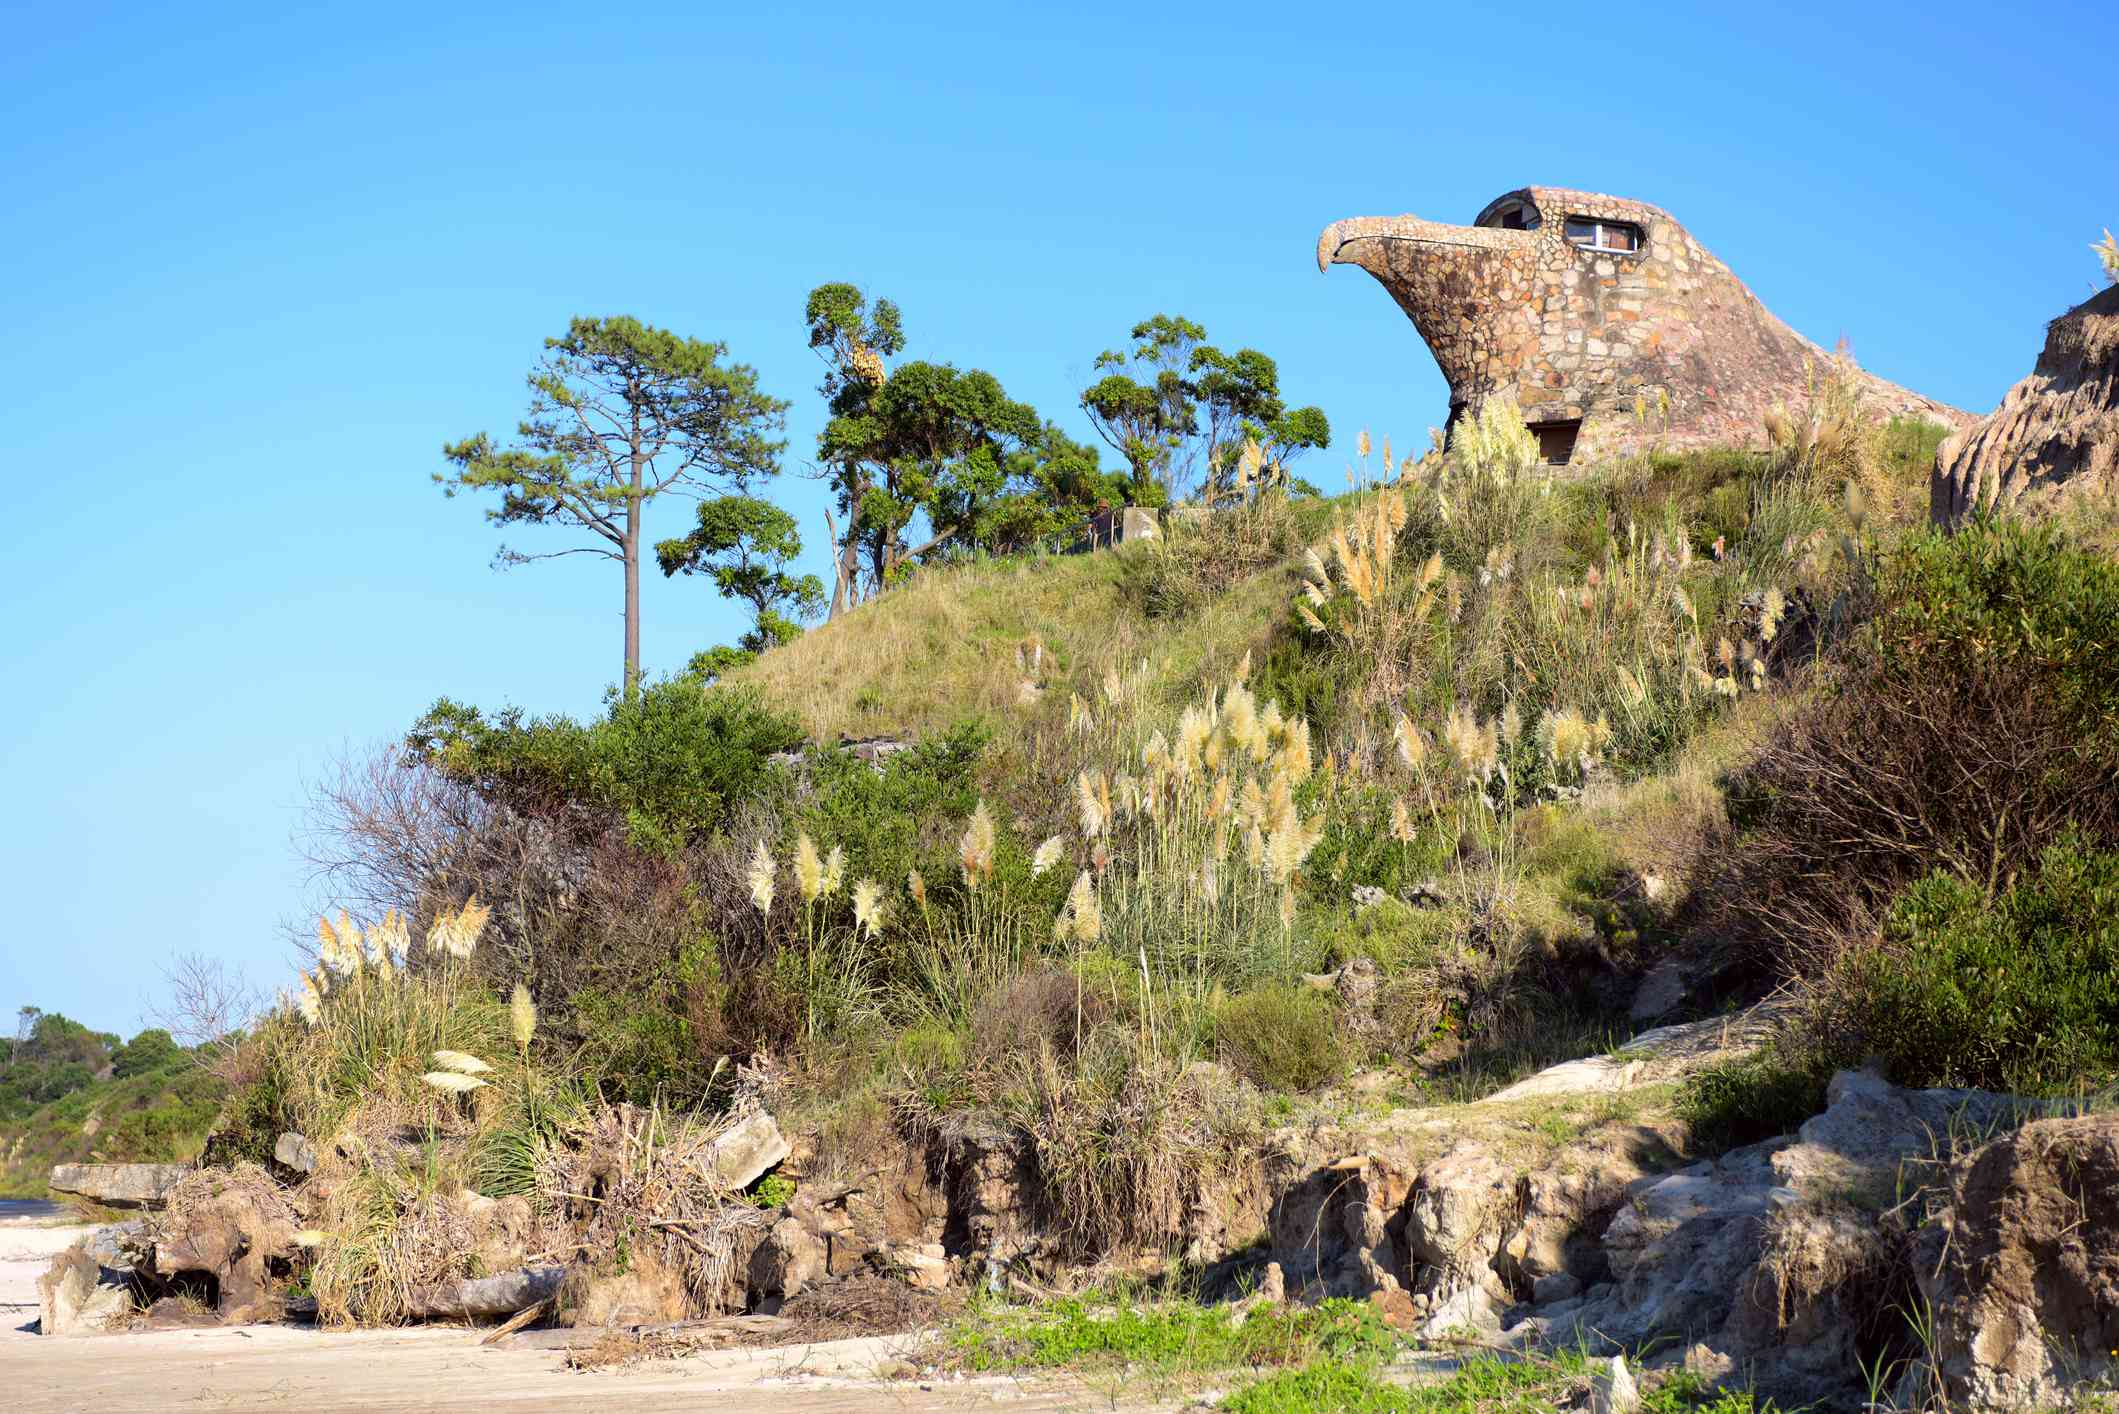 A general view of El Aguila (The Eagle), Atlantida, Uruguay